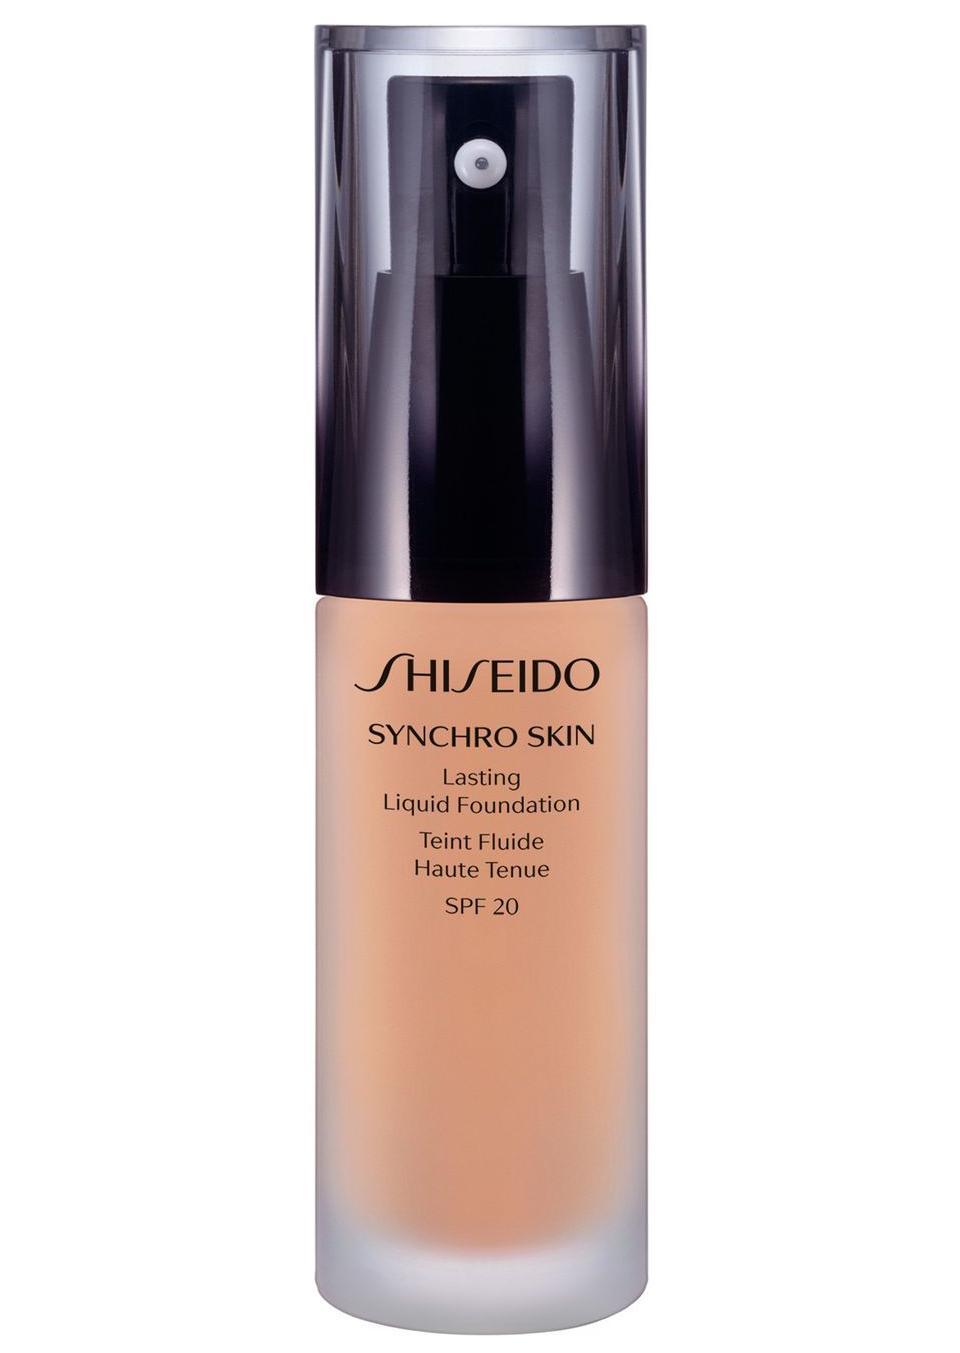 SHISEIDO Synchro Skin Lasting Liquid Foundation